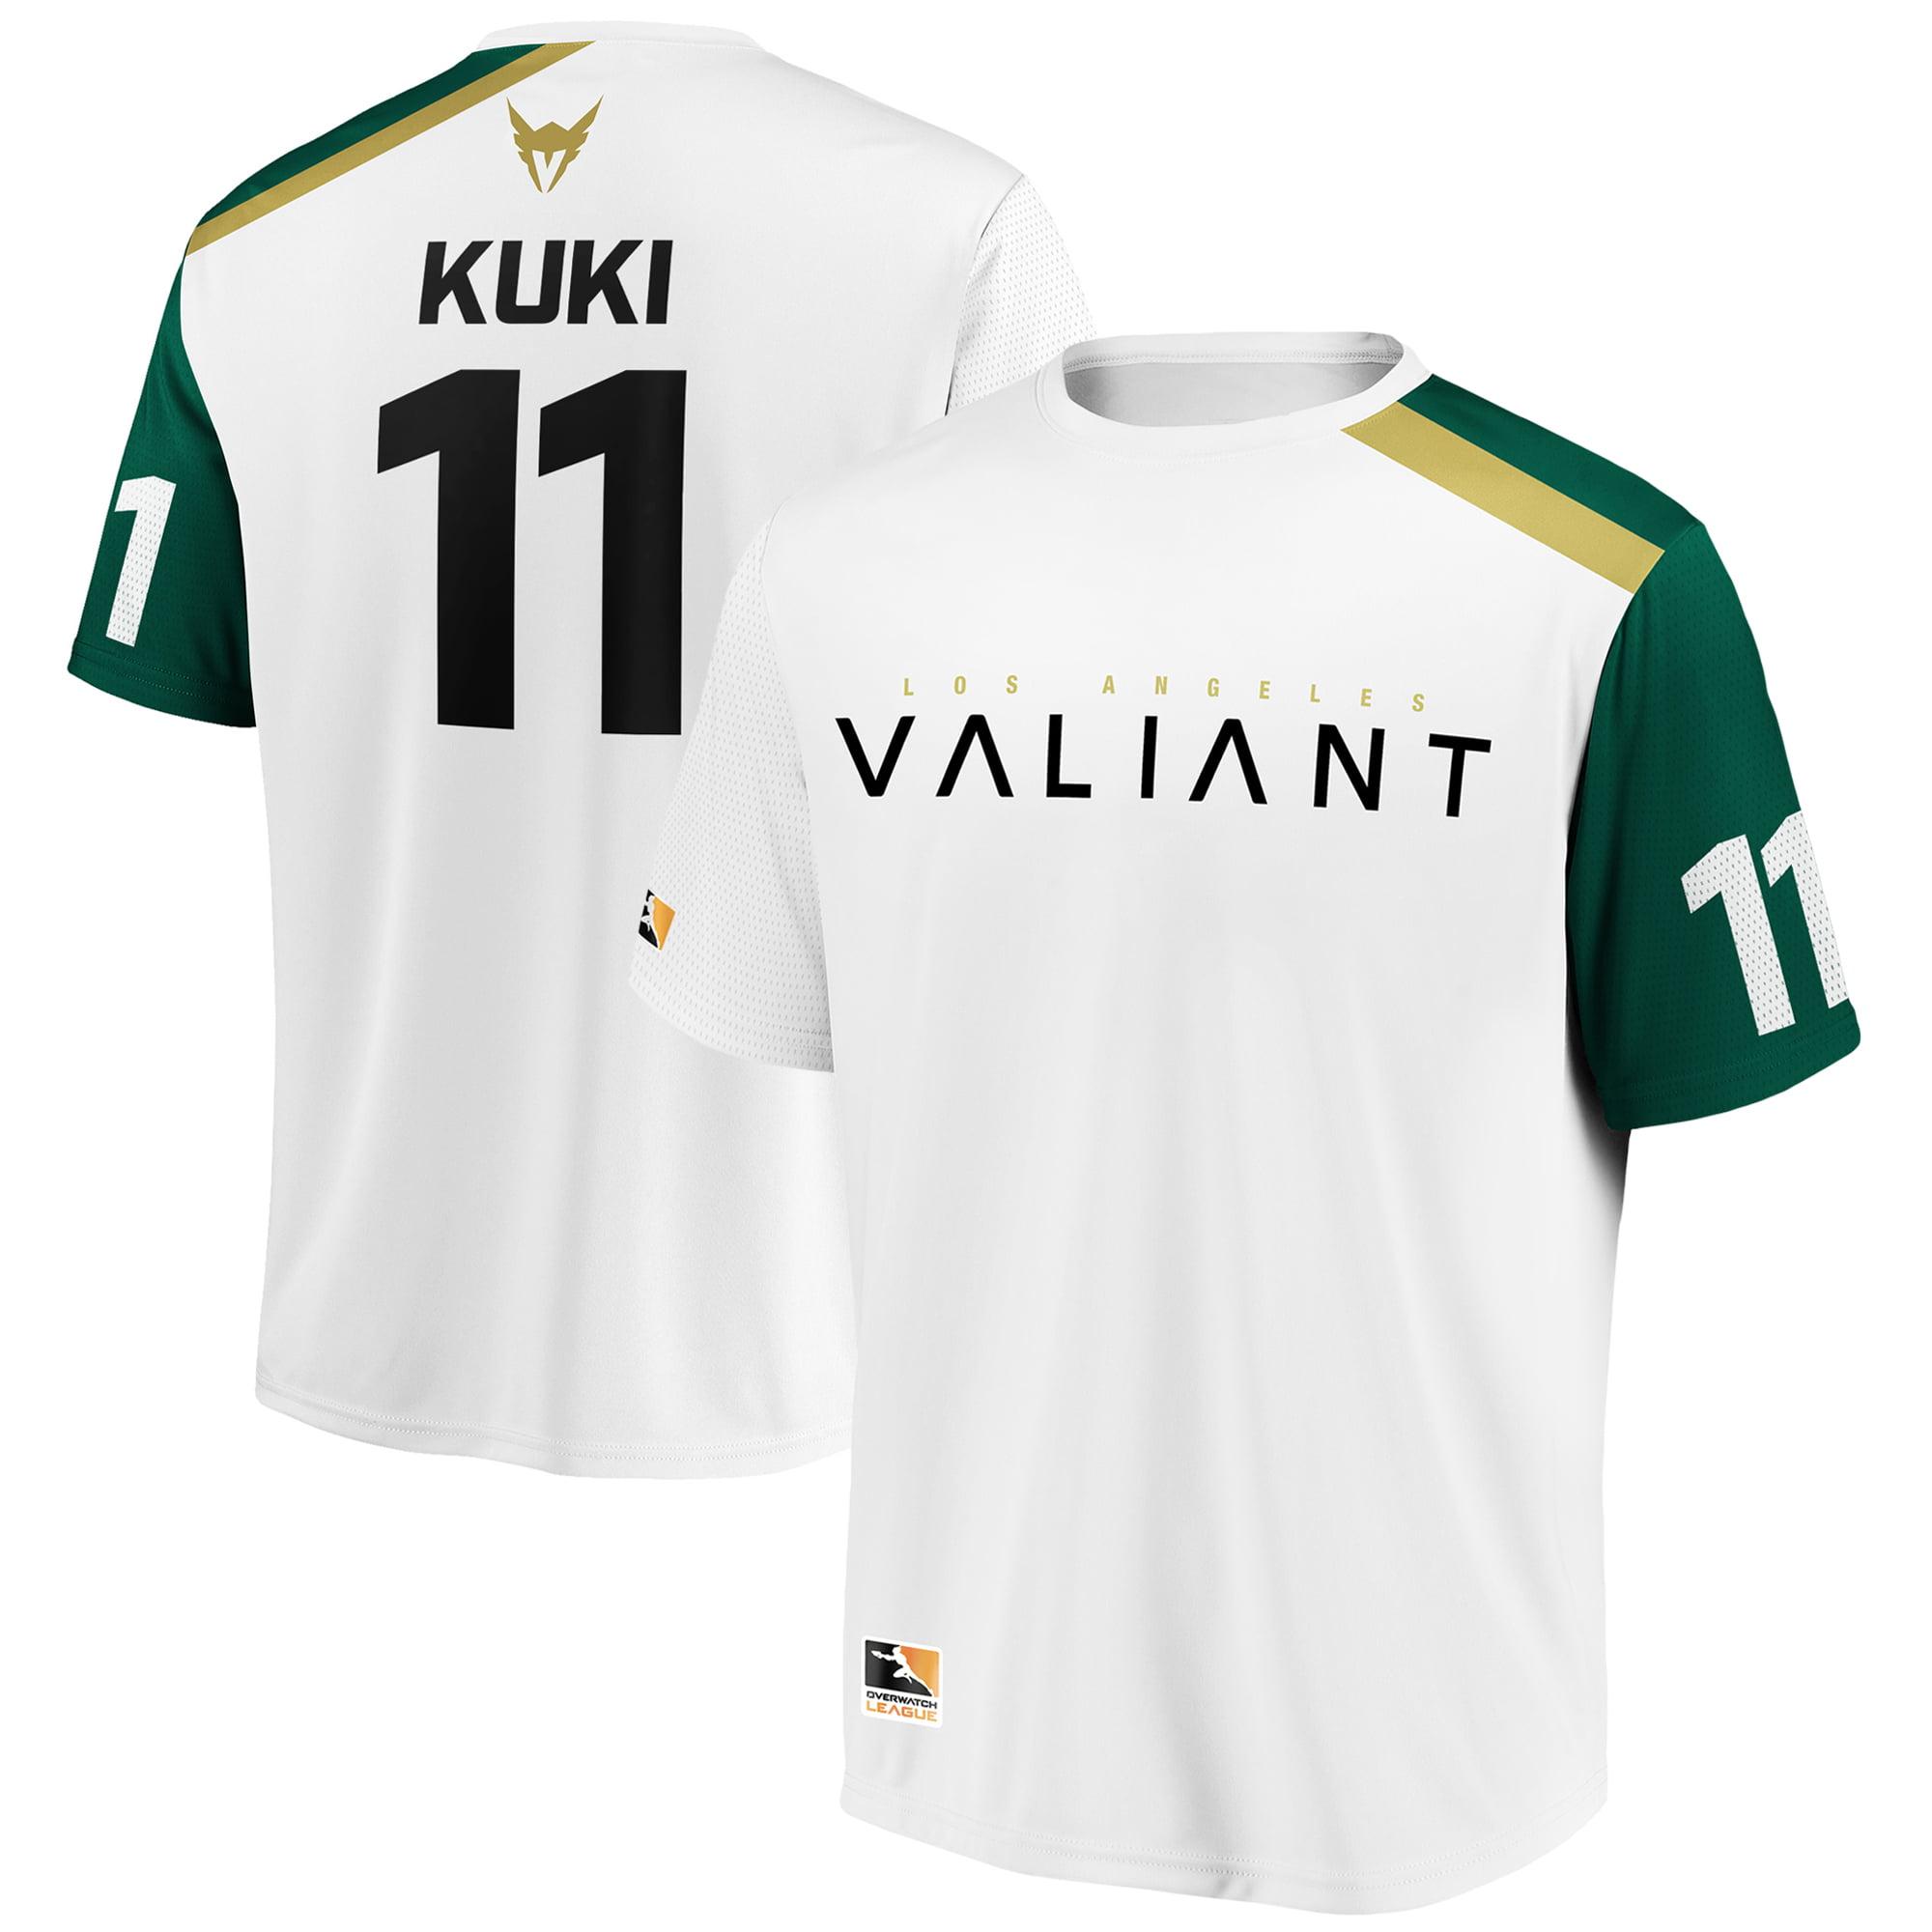 KuKi Los Angeles Valiant Overwatch League Replica Away Jersey - White